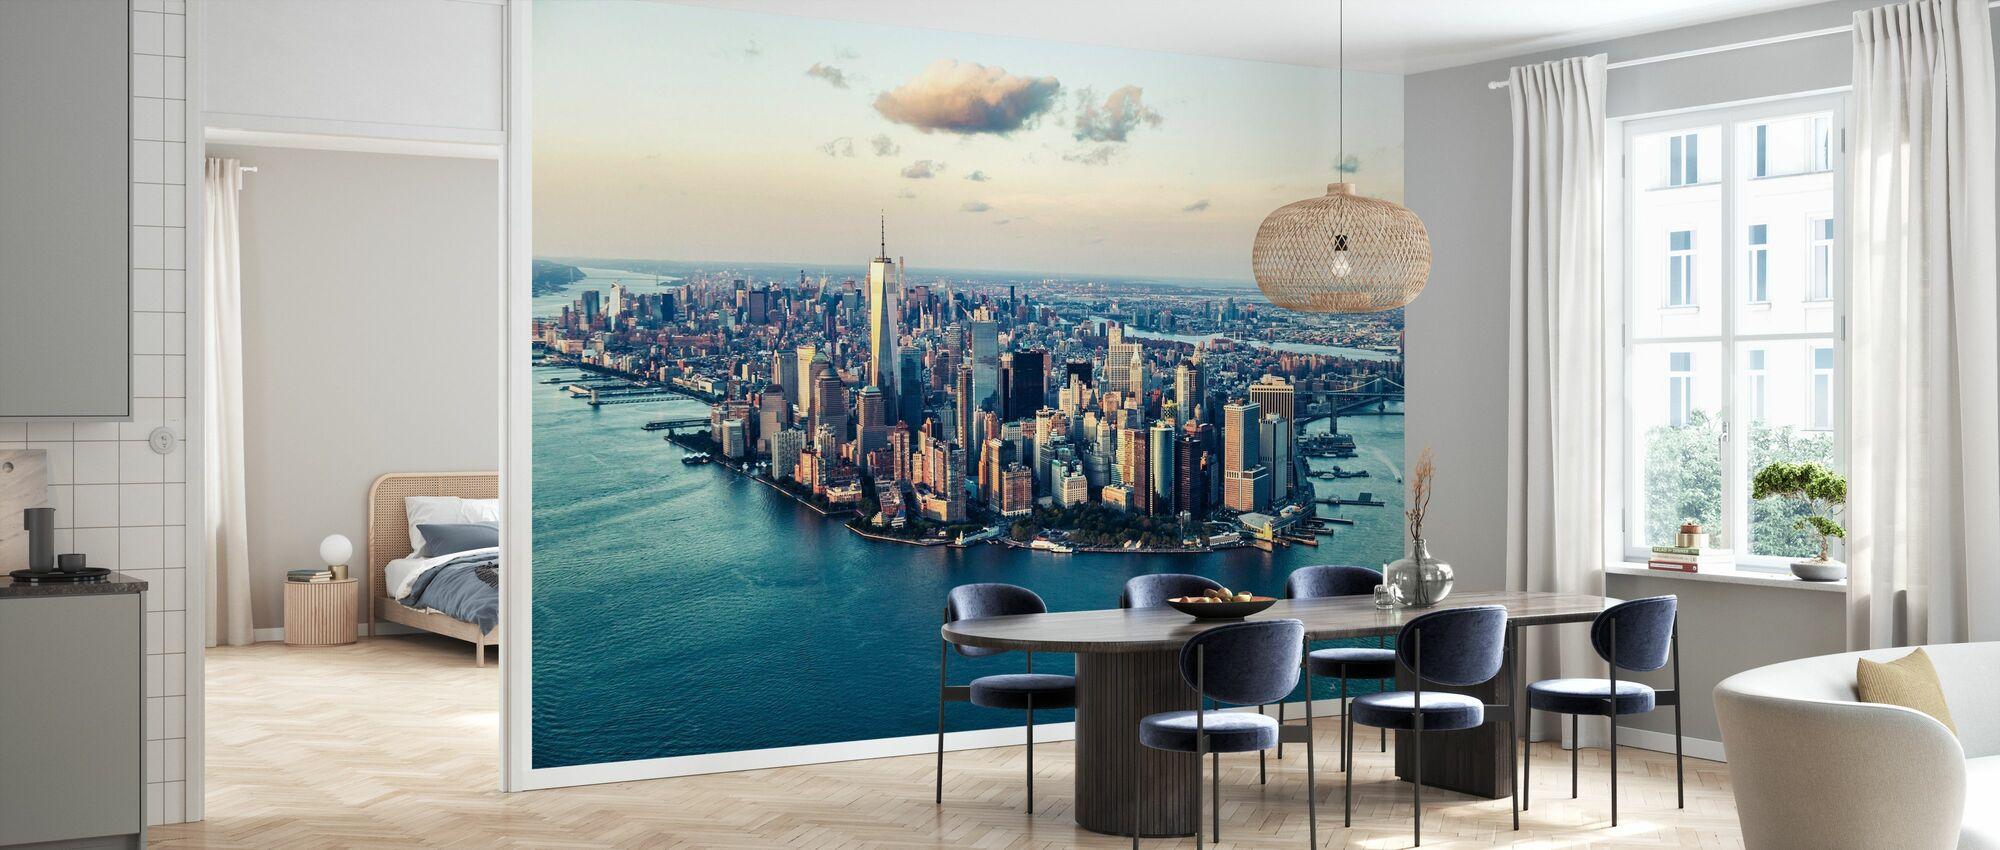 City of Dreams - Wallpaper - Kitchen